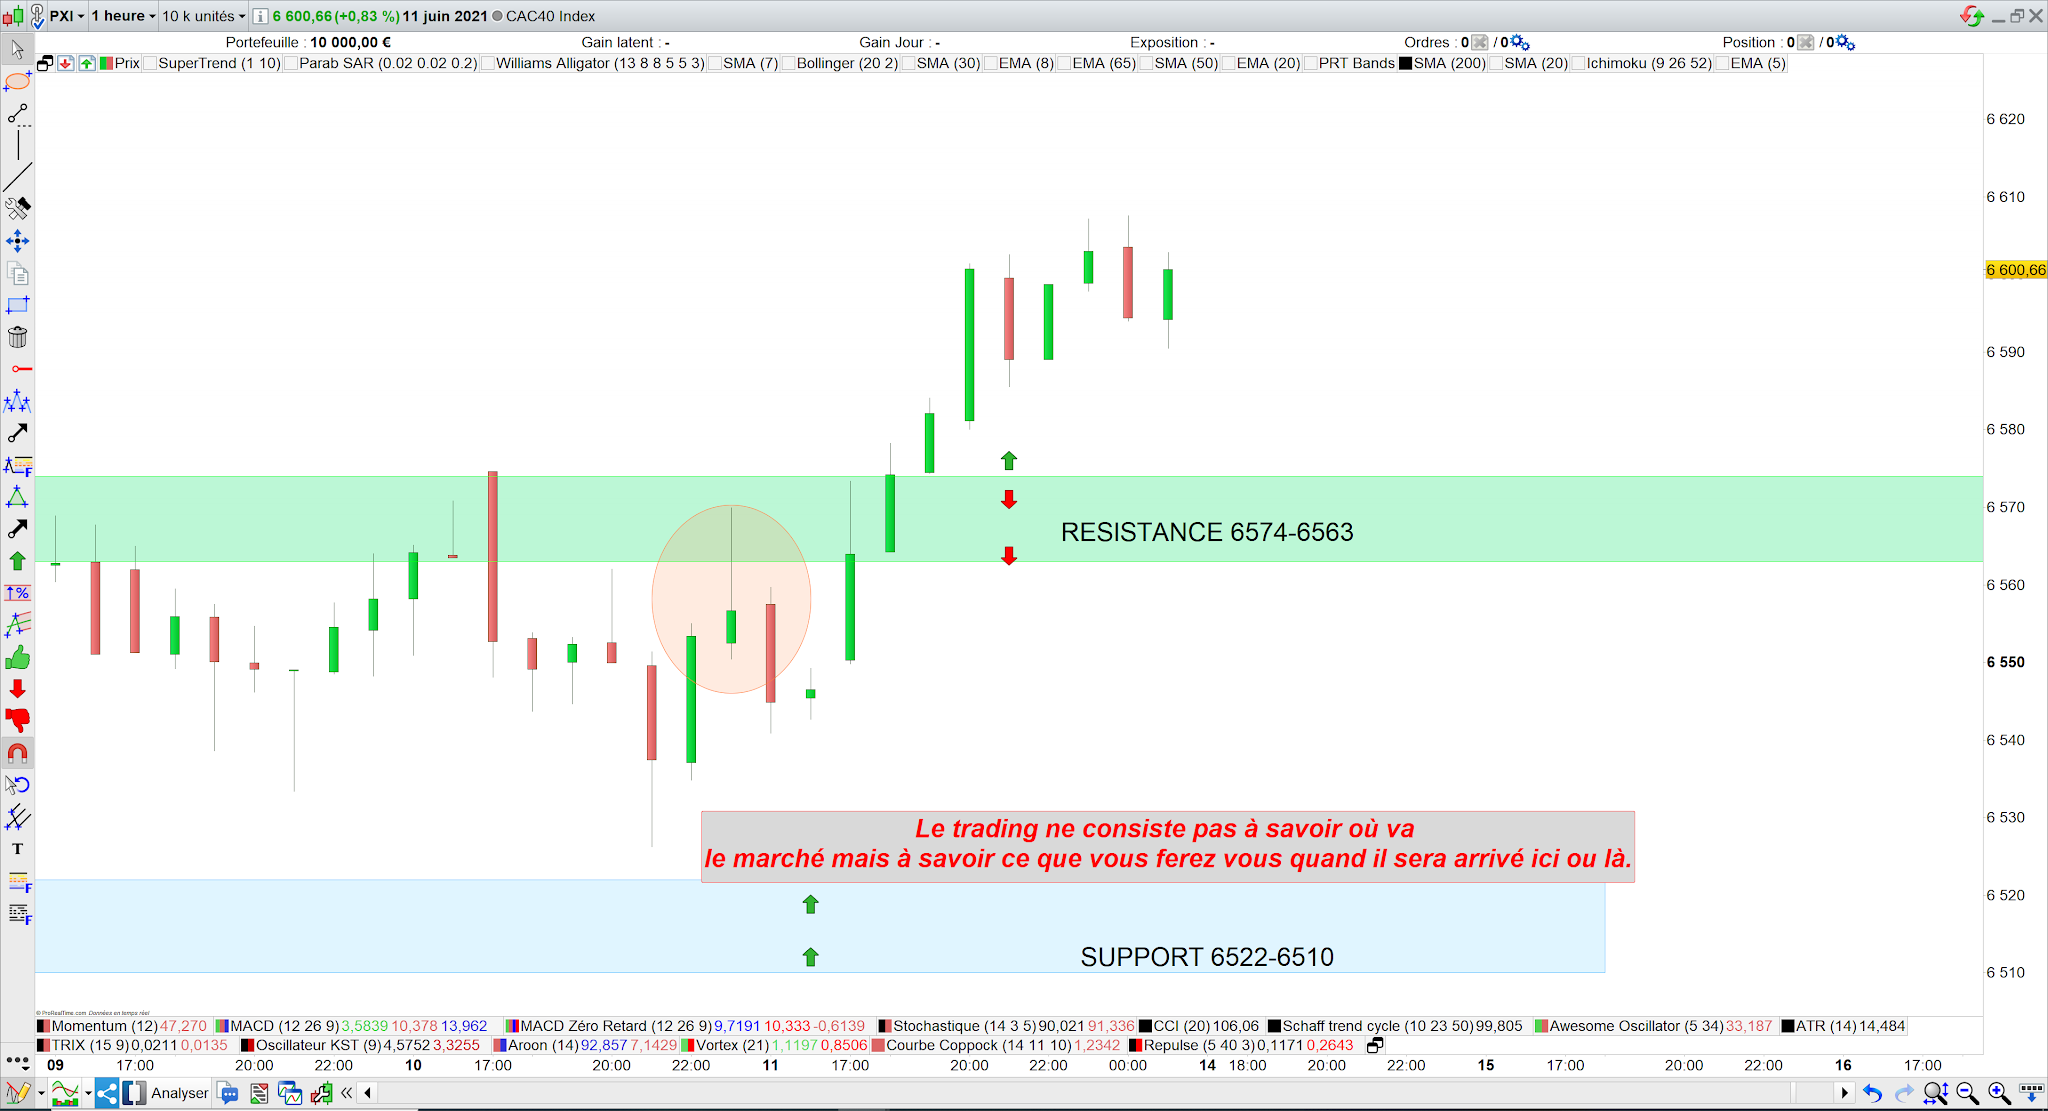 Trading cac40 14 juin 21